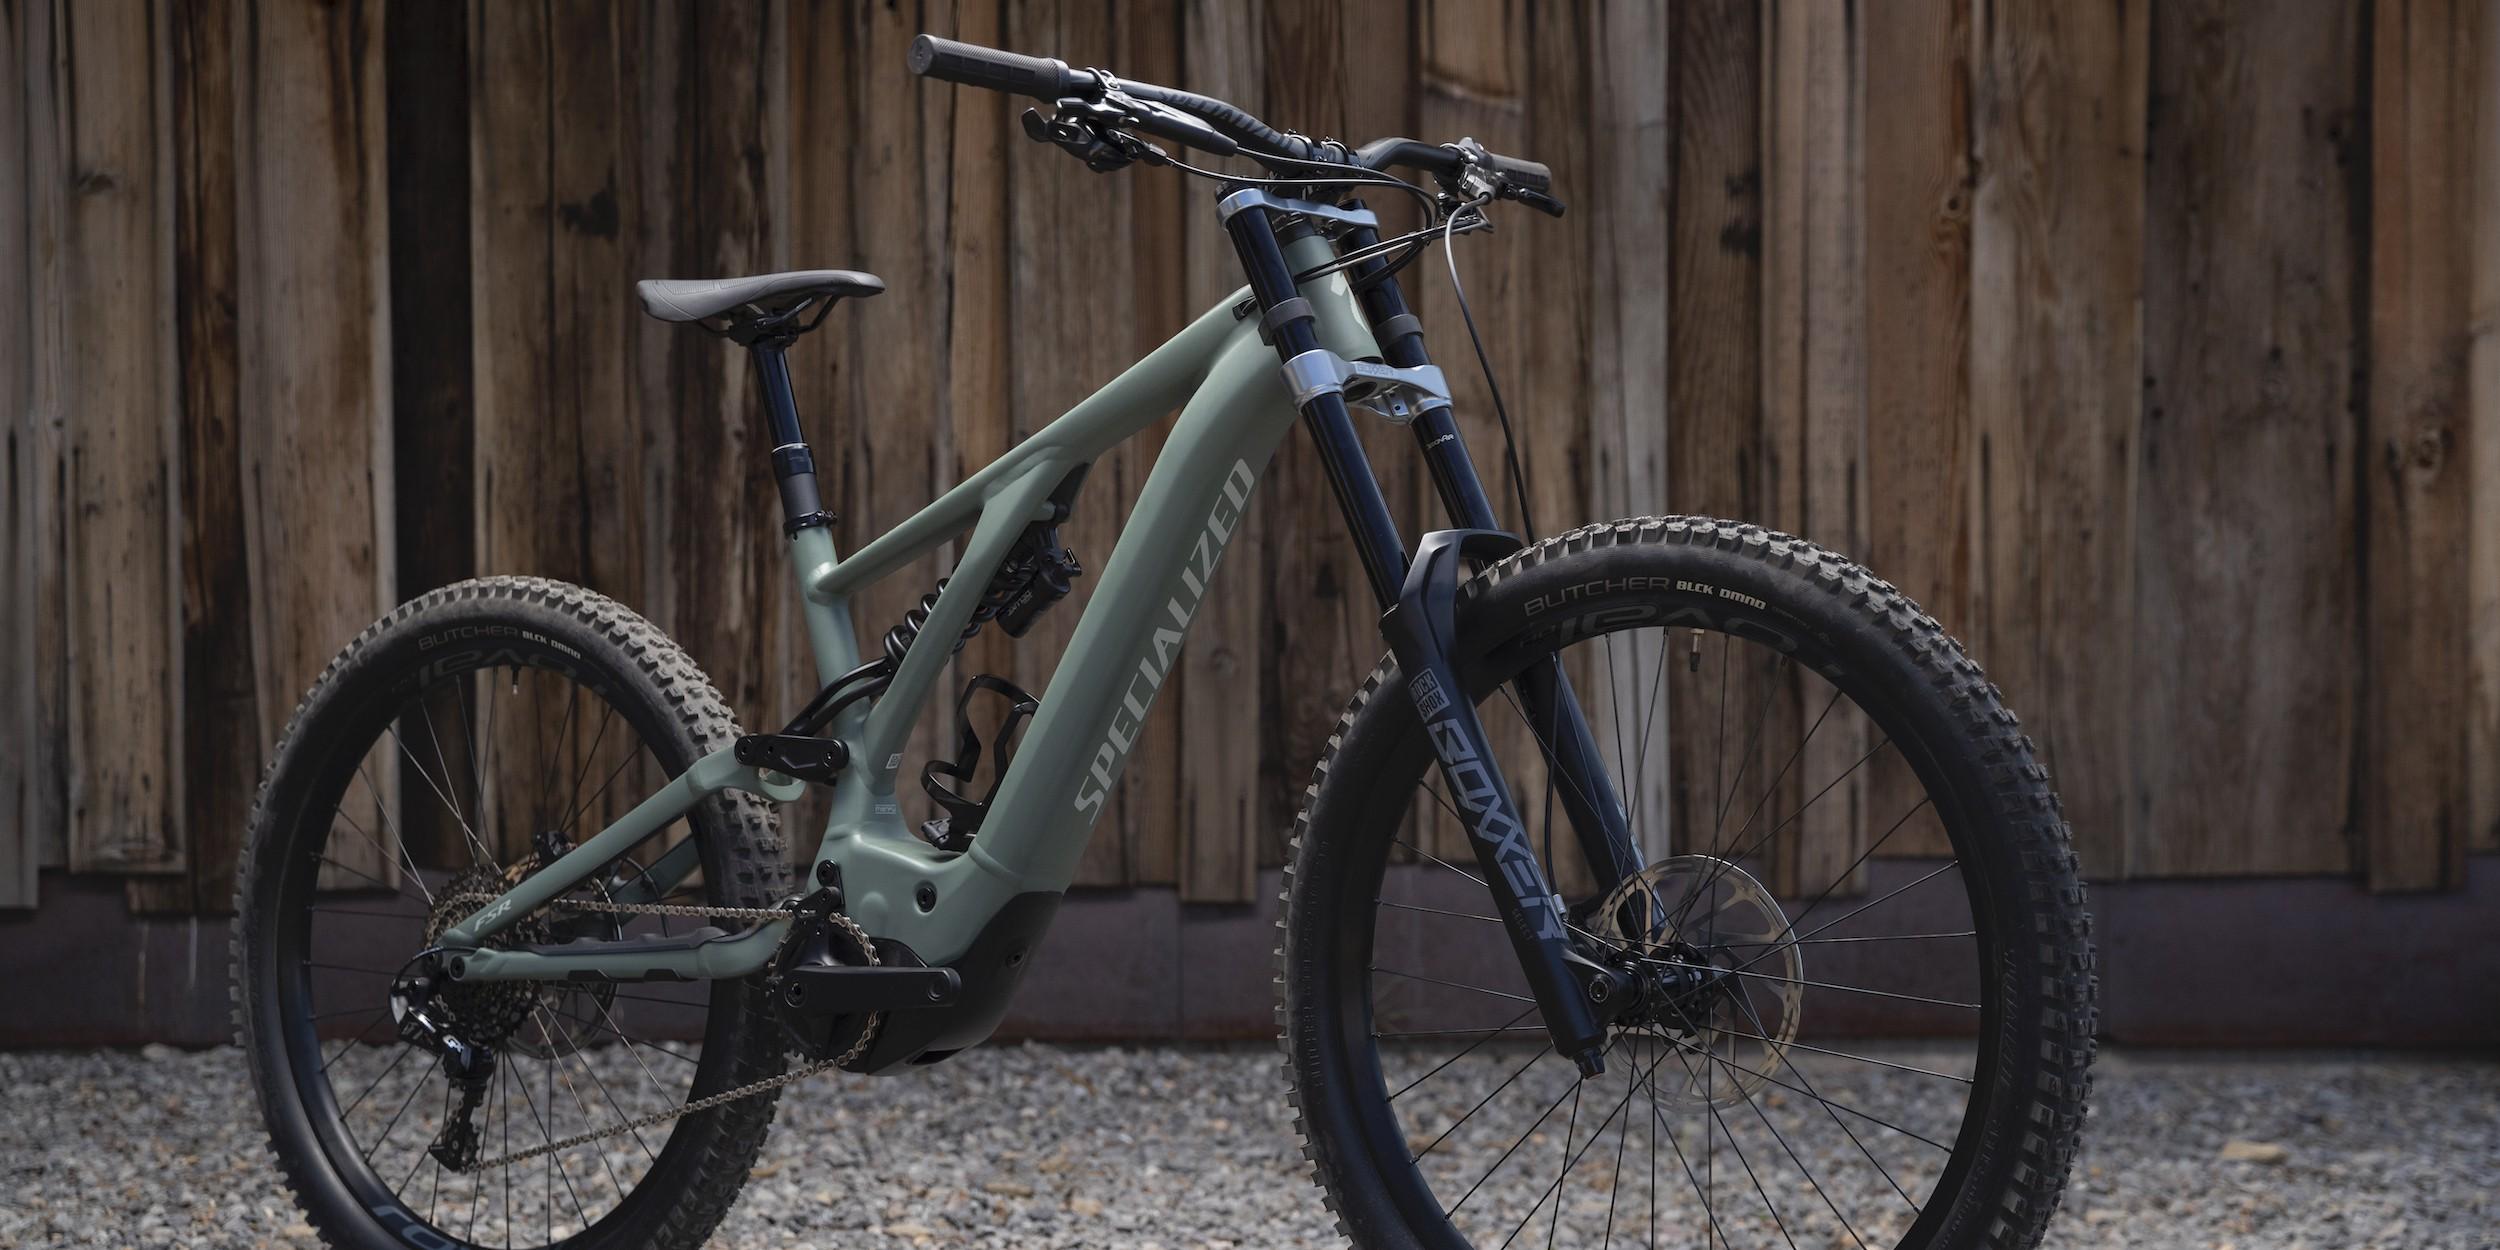 mountainbike fully tests berichte und fotos. Black Bedroom Furniture Sets. Home Design Ideas